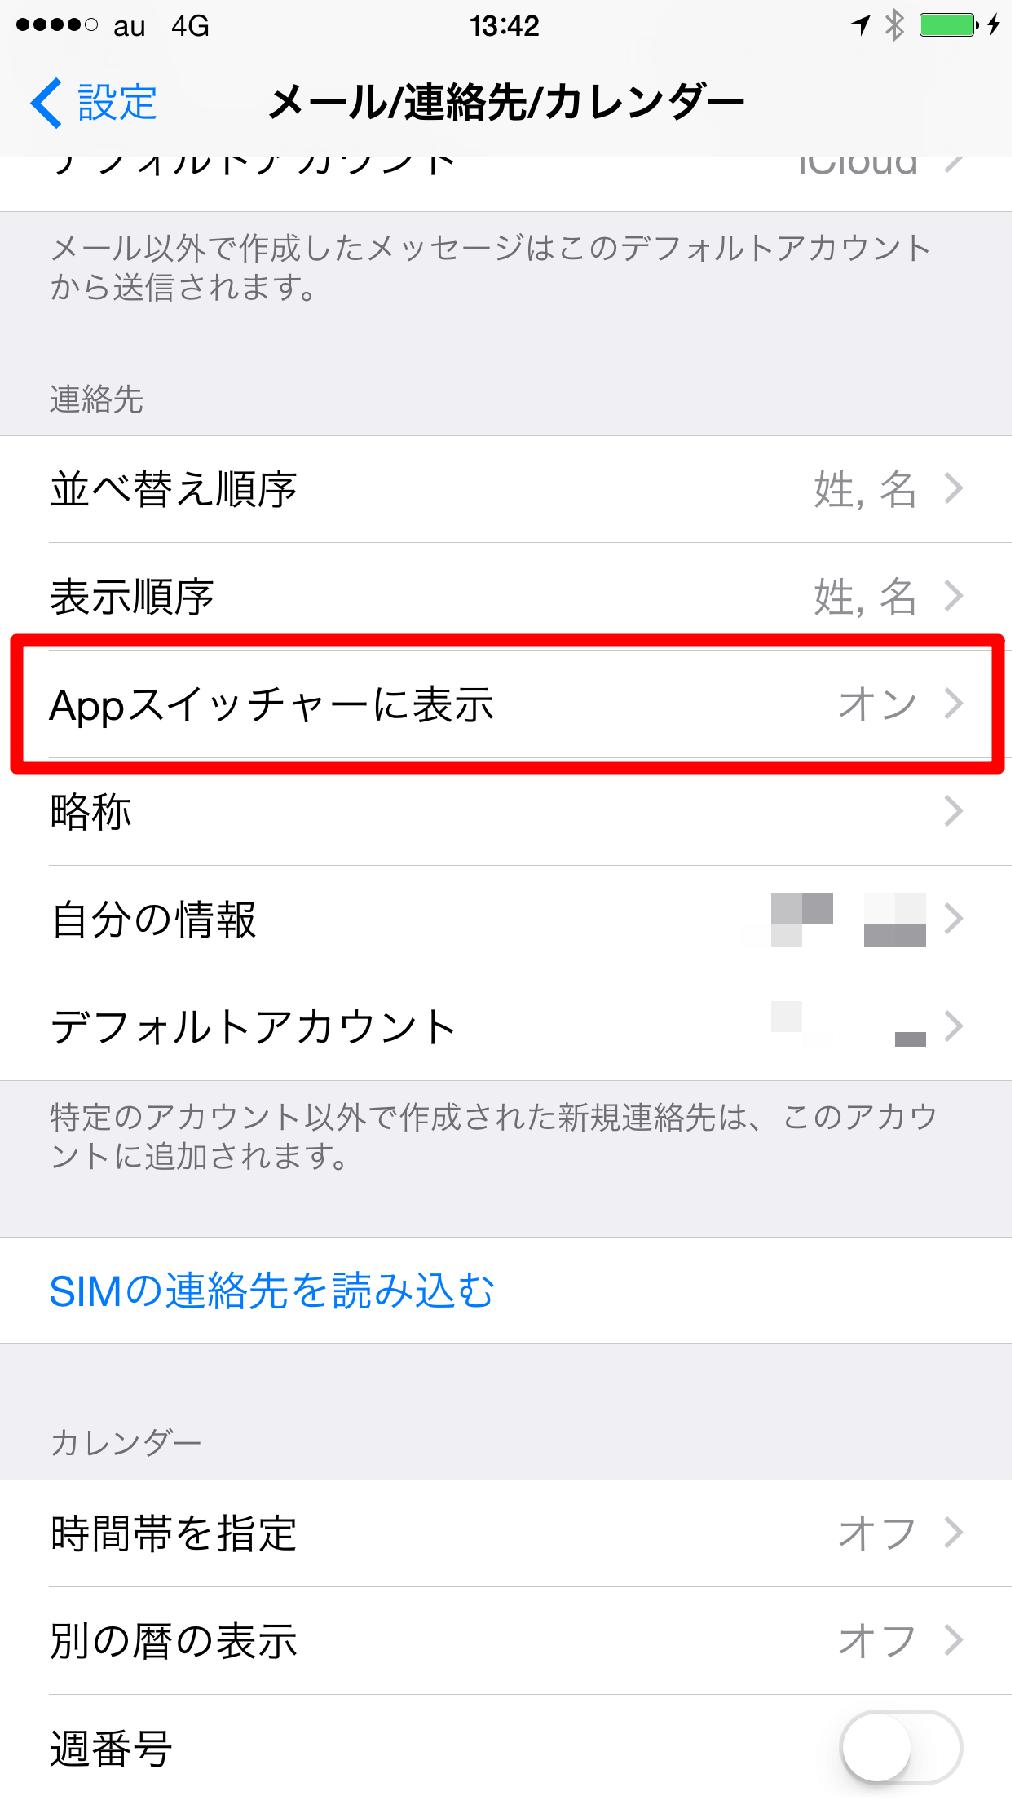 [Appスイッチャーに表示]をタップする画面